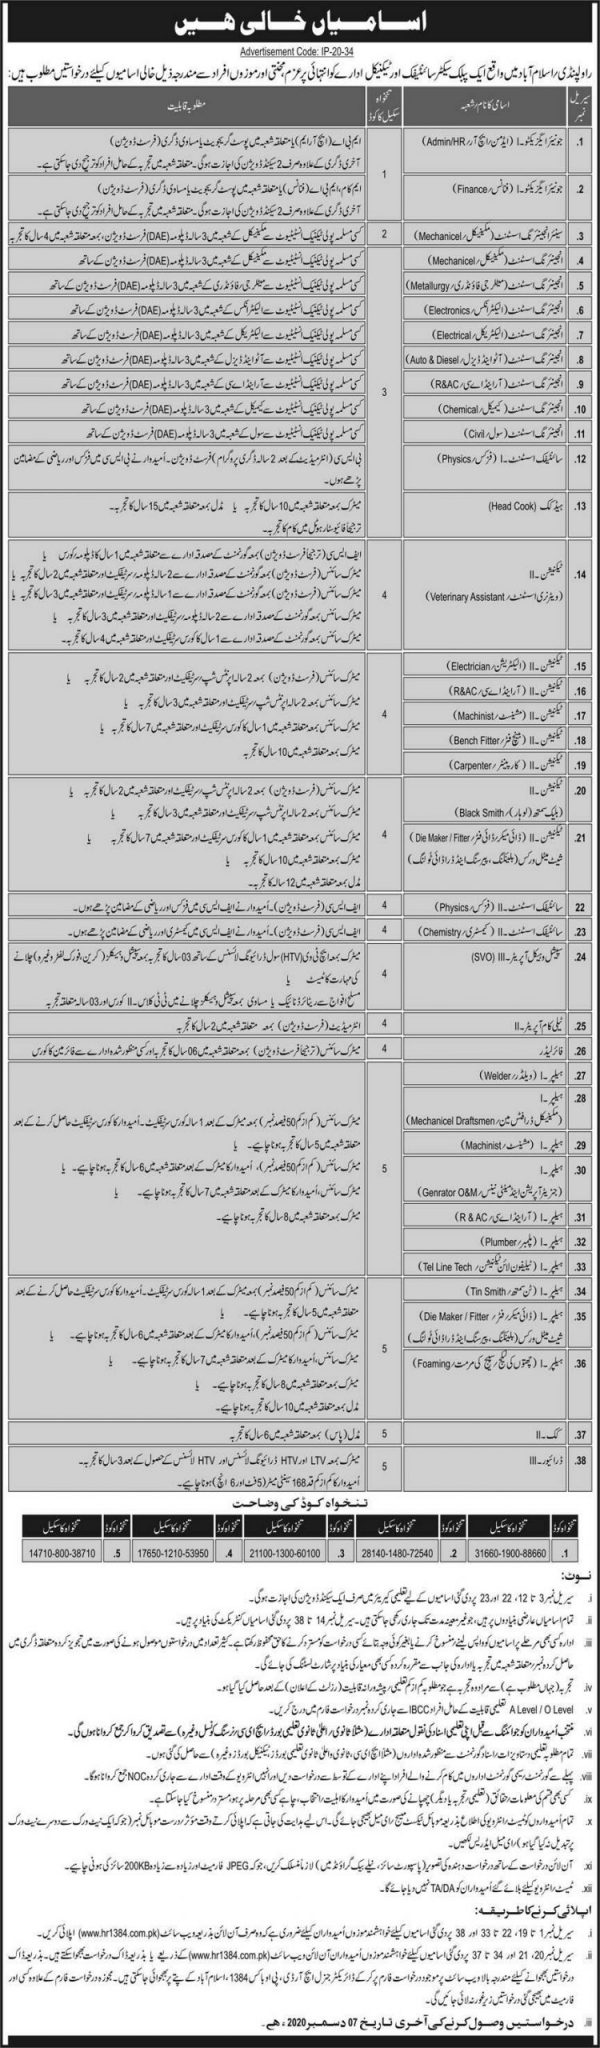 www.hr1384.com.pk Jobs 2021 Apply Online Eligibility Criteria Technicianswww.hr1384.com.pk Jobs 2021 Apply Online Eligibility Criteria Technicians